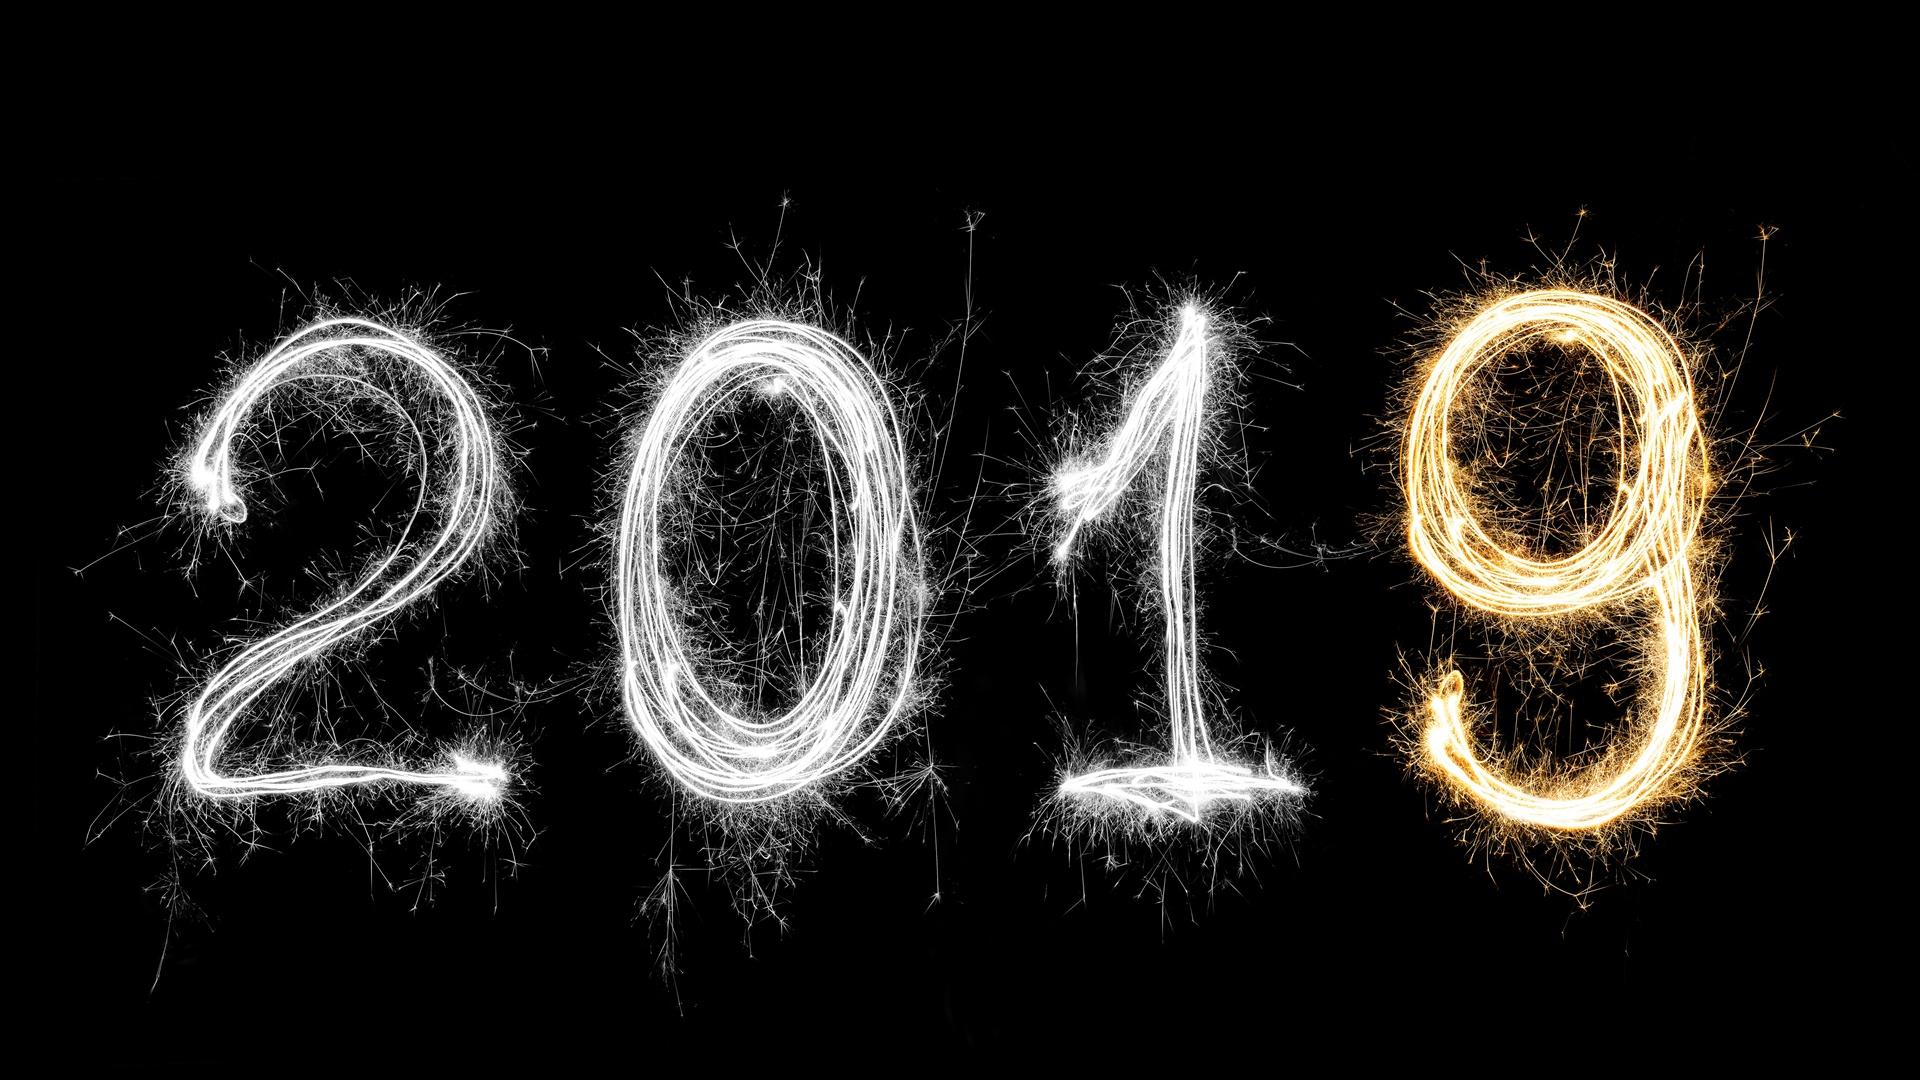 Va dorim un An Nou Fericit